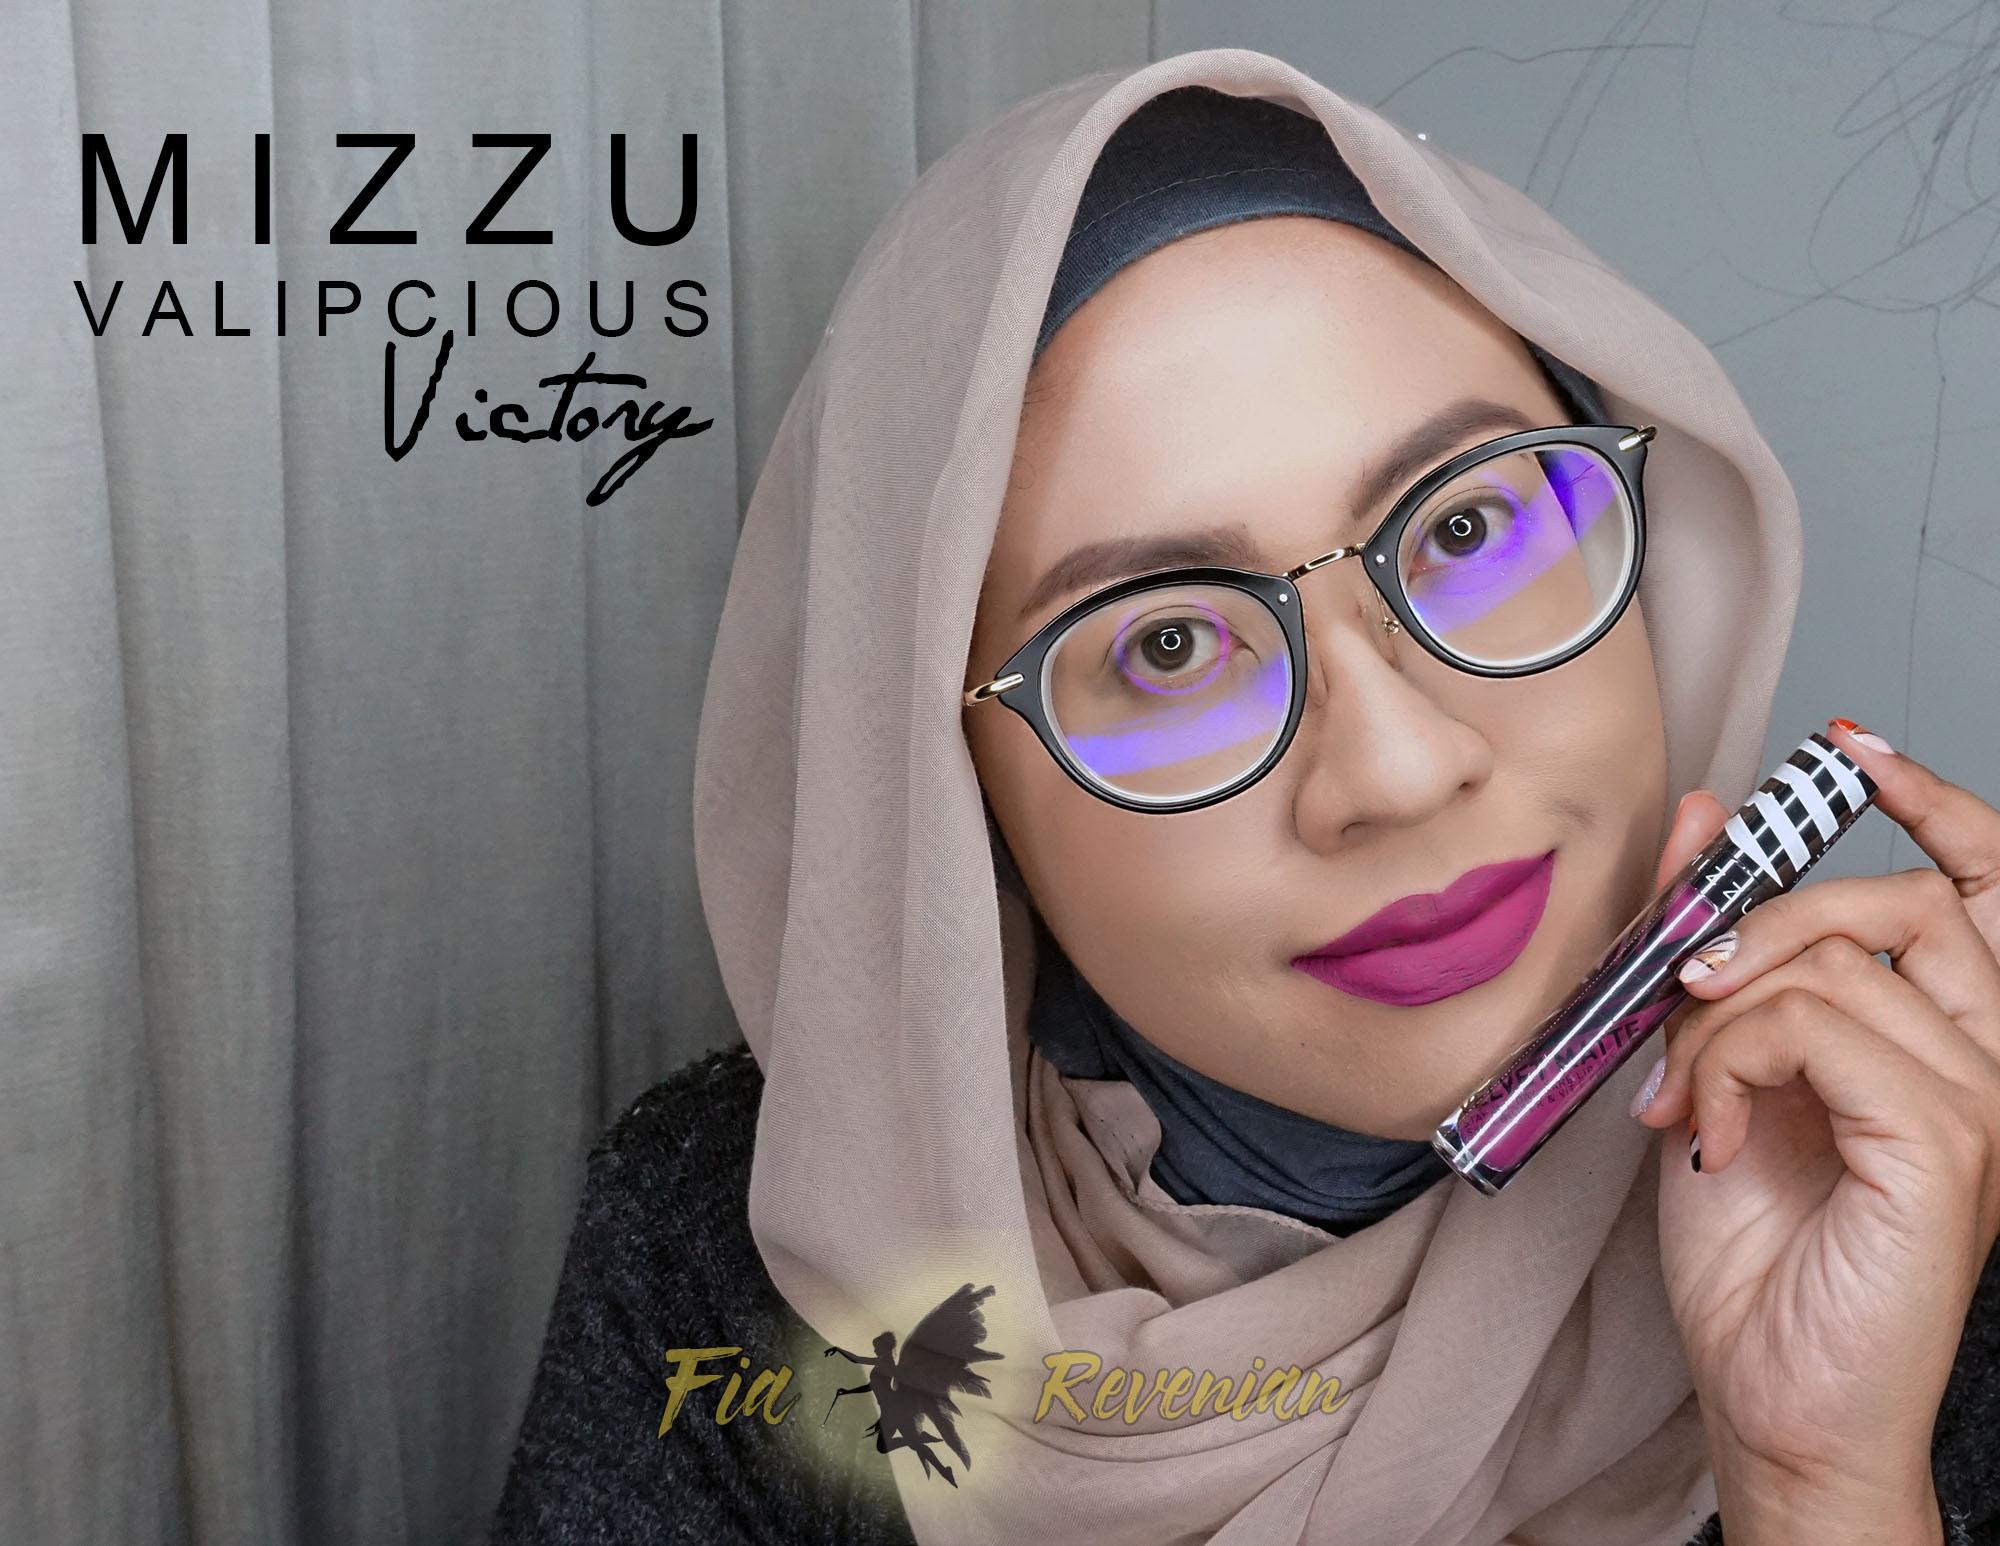 Mizzu_Valipcious_Lip_Cream_Victory